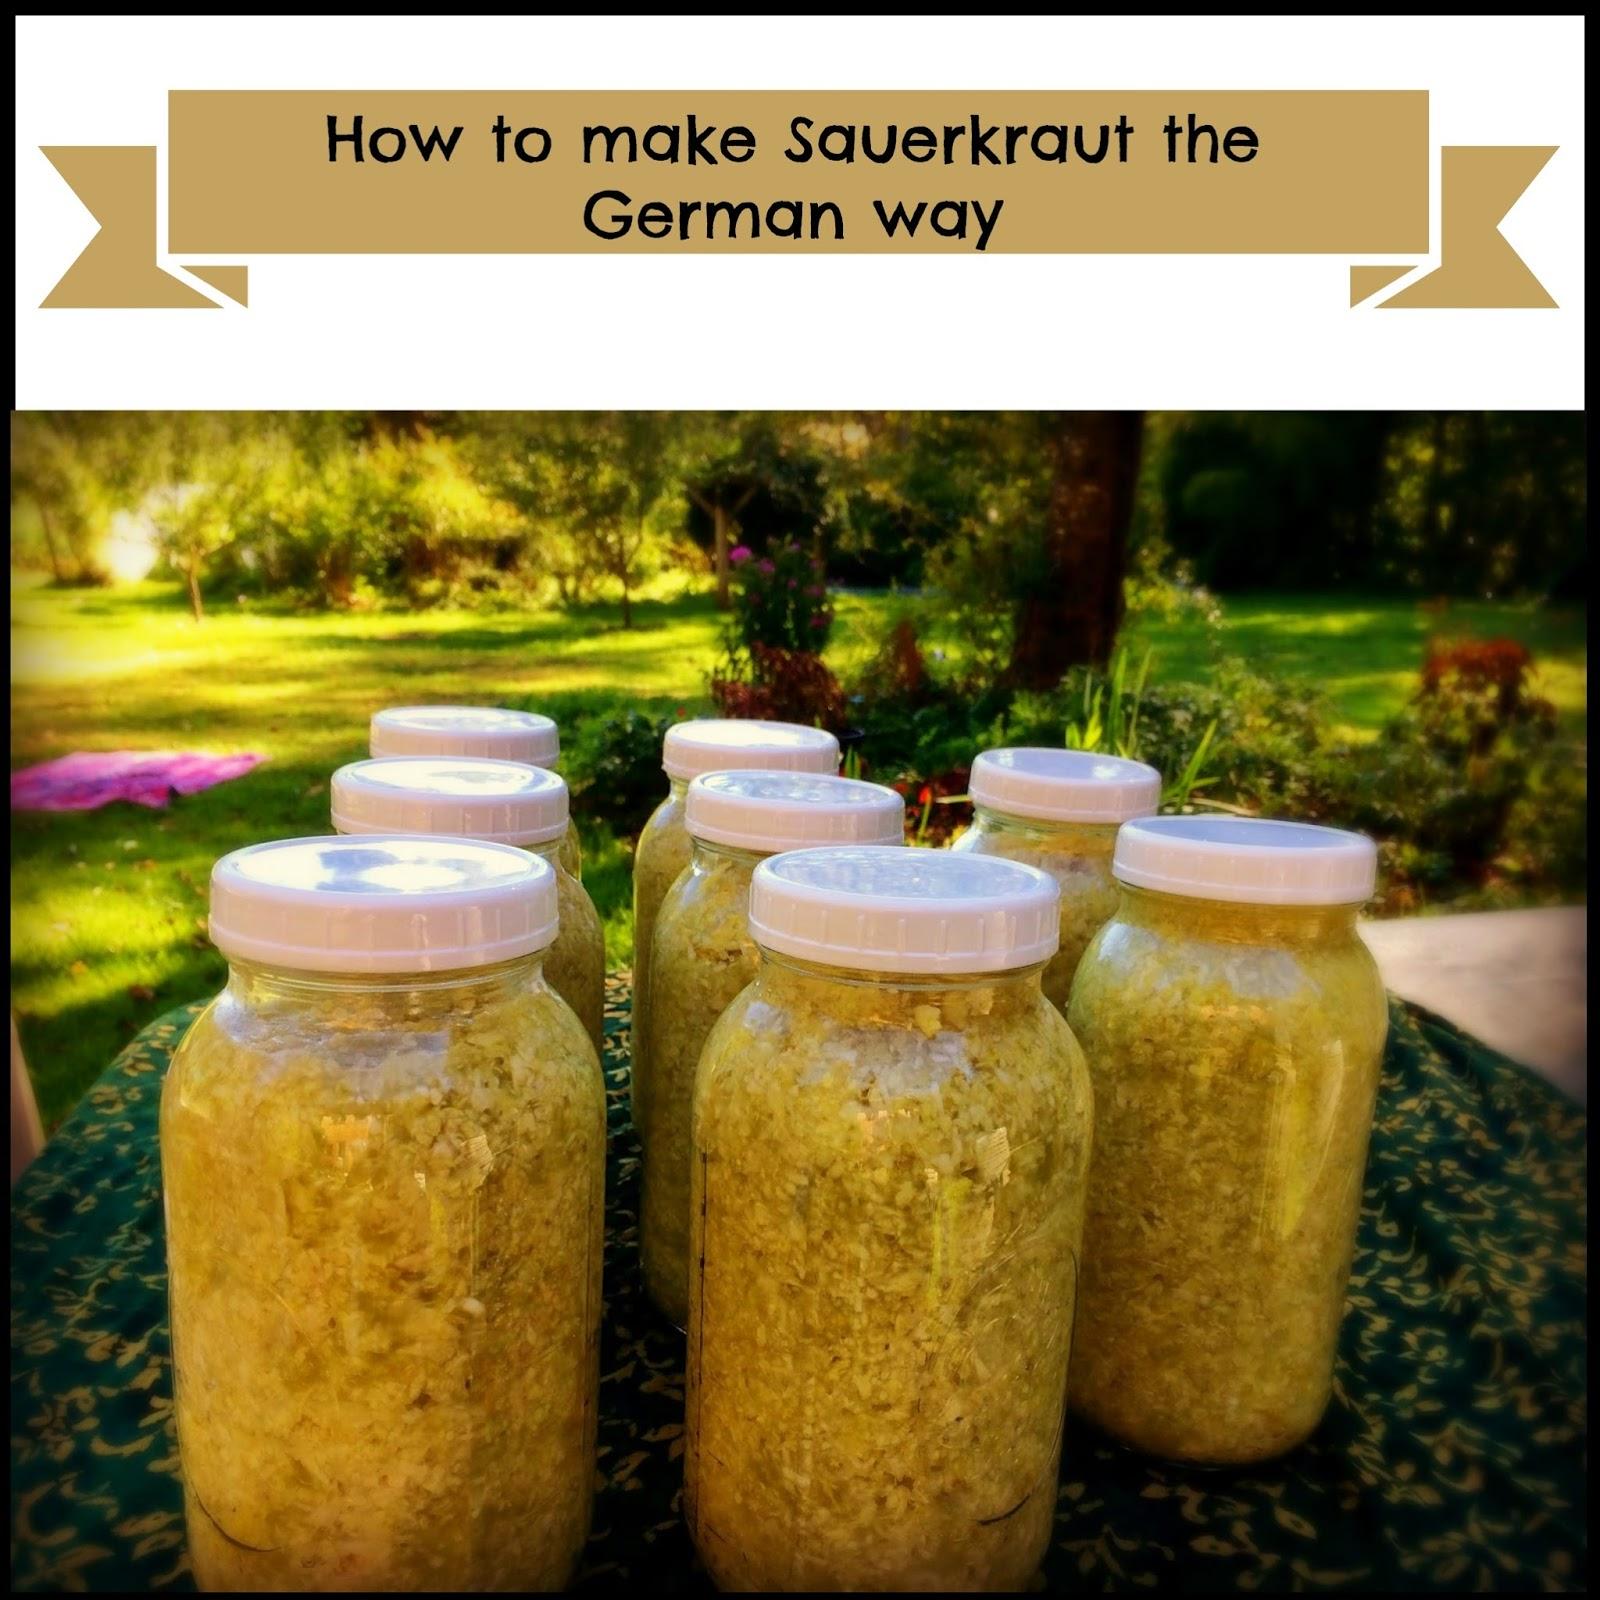 How to make sauerkraut at home 48